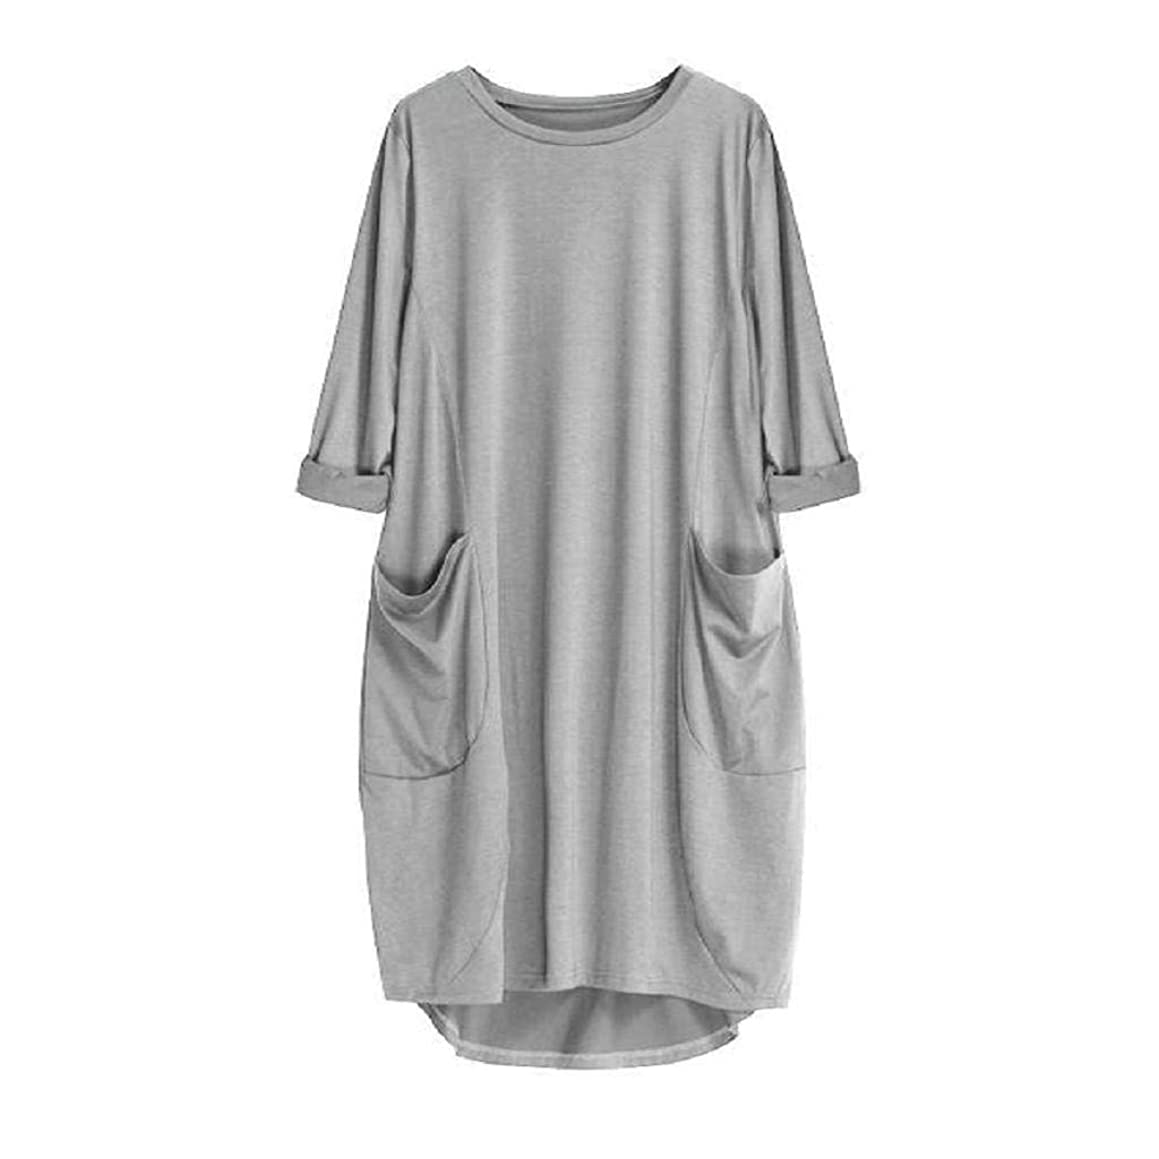 Women's Dresses-Pocket Loose Dress Ladies Crew Neck Casual Long Tops Plus Size